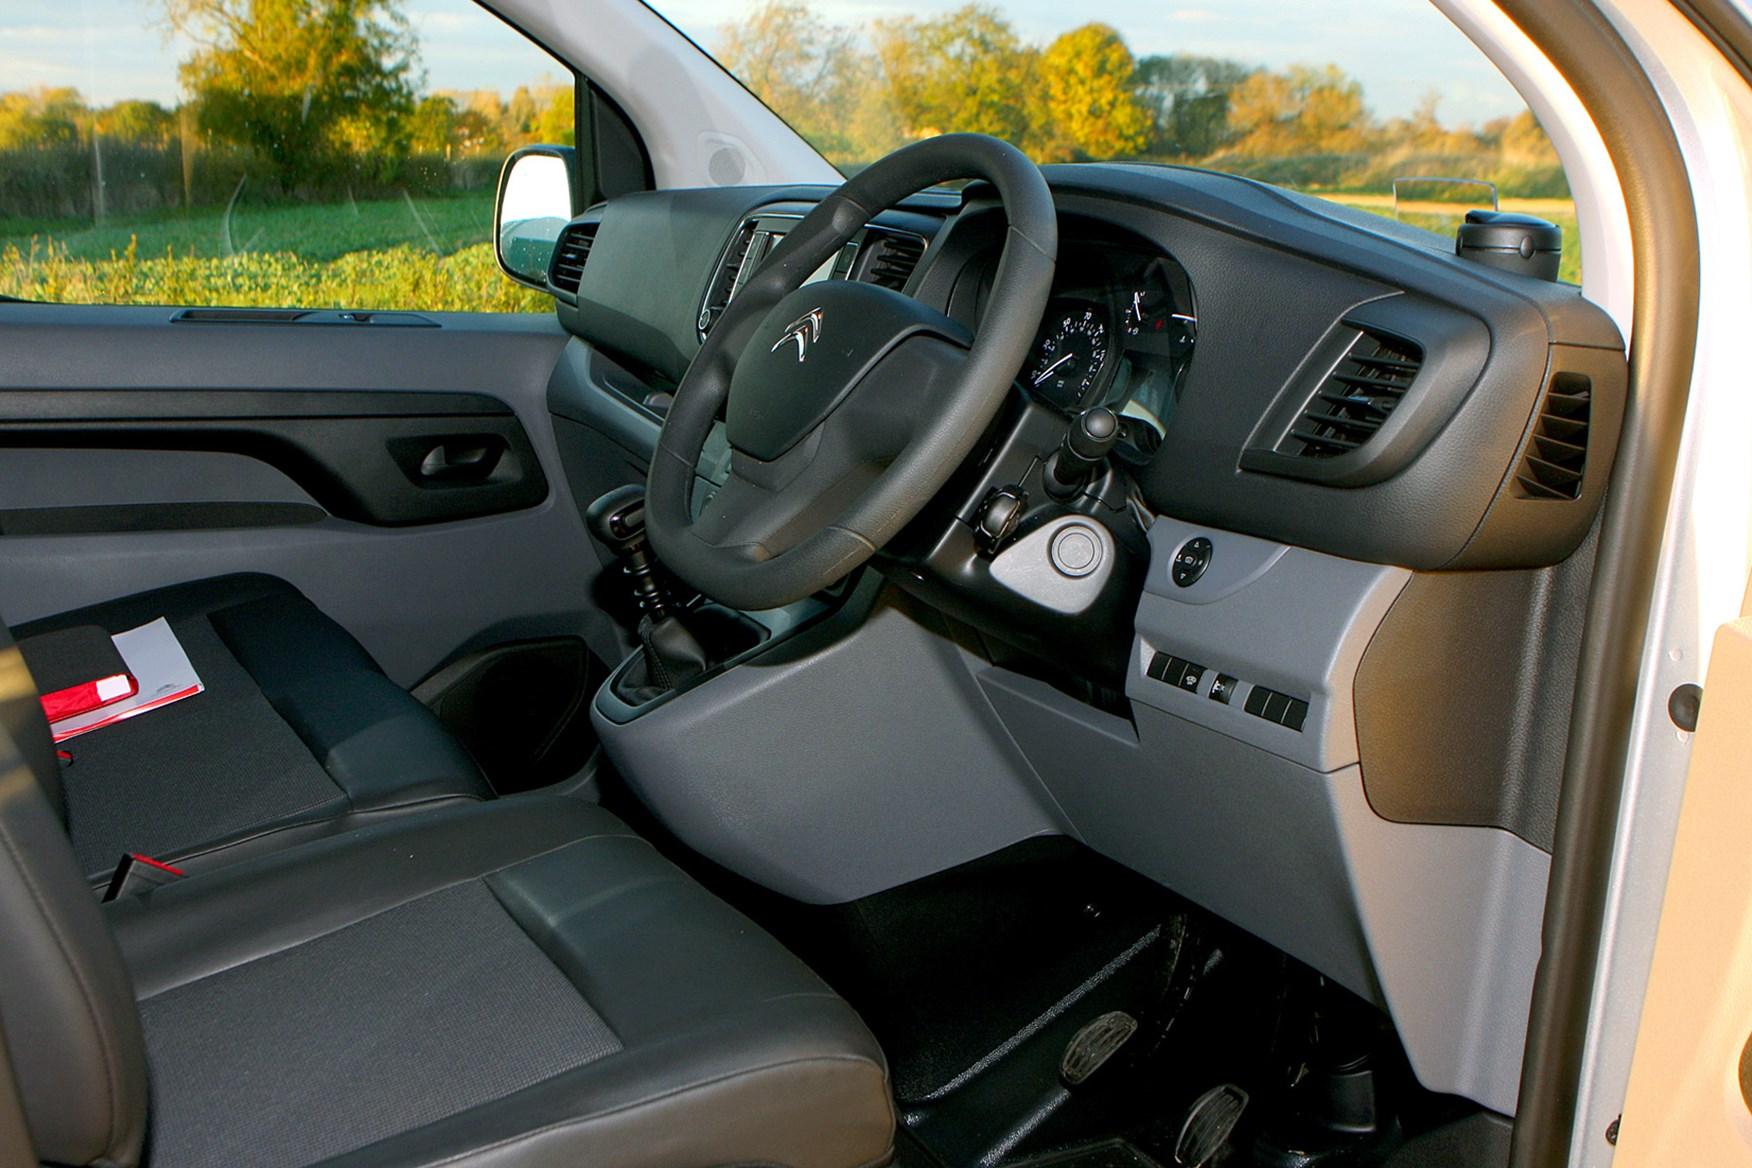 Citroen Dispatch review - cab interior